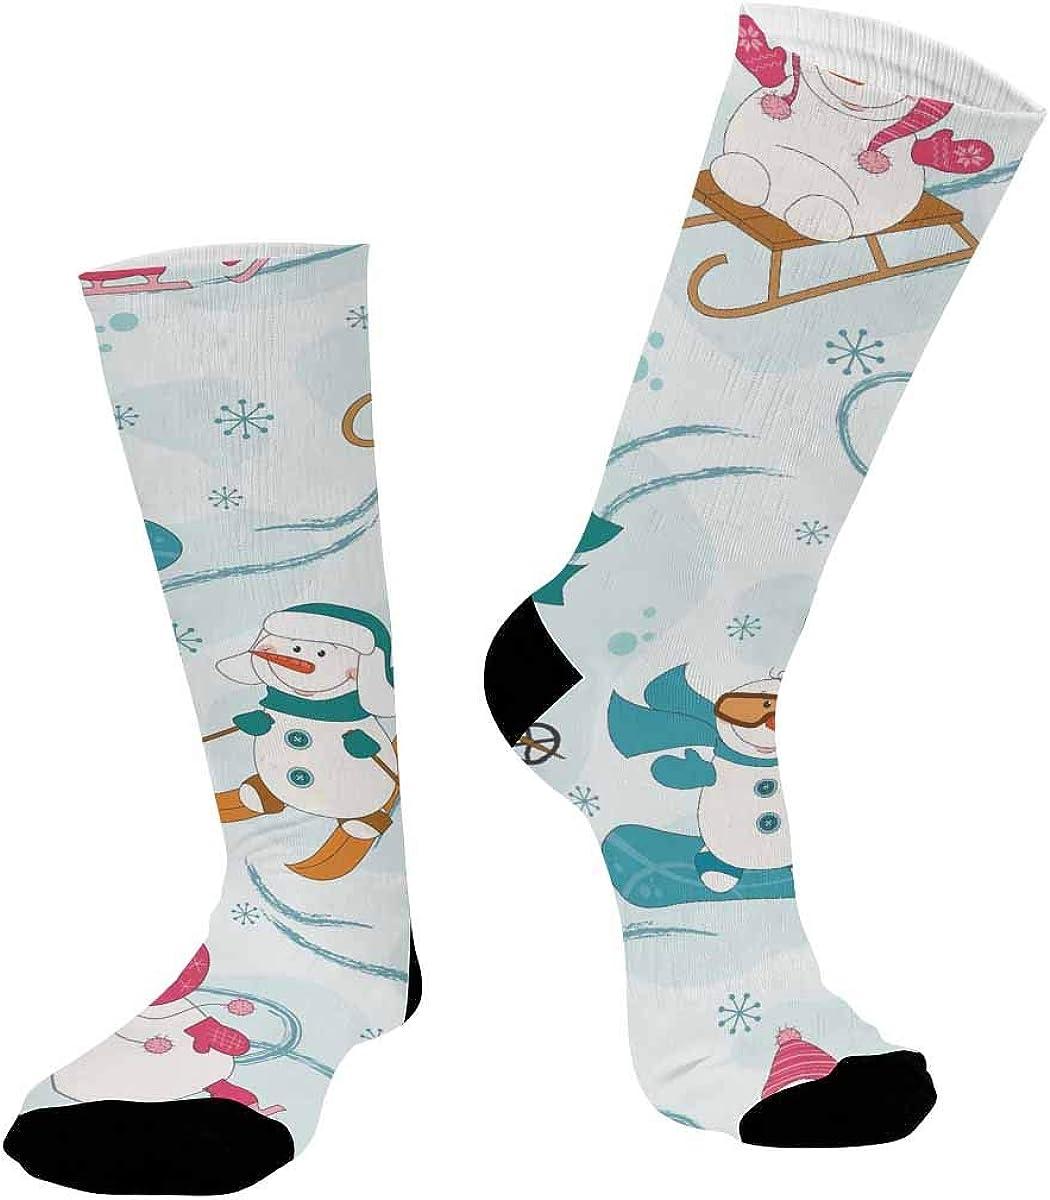 INTERESTPRINT Casual Sublimated Crew Socks Unisex Winter Sport Snowman